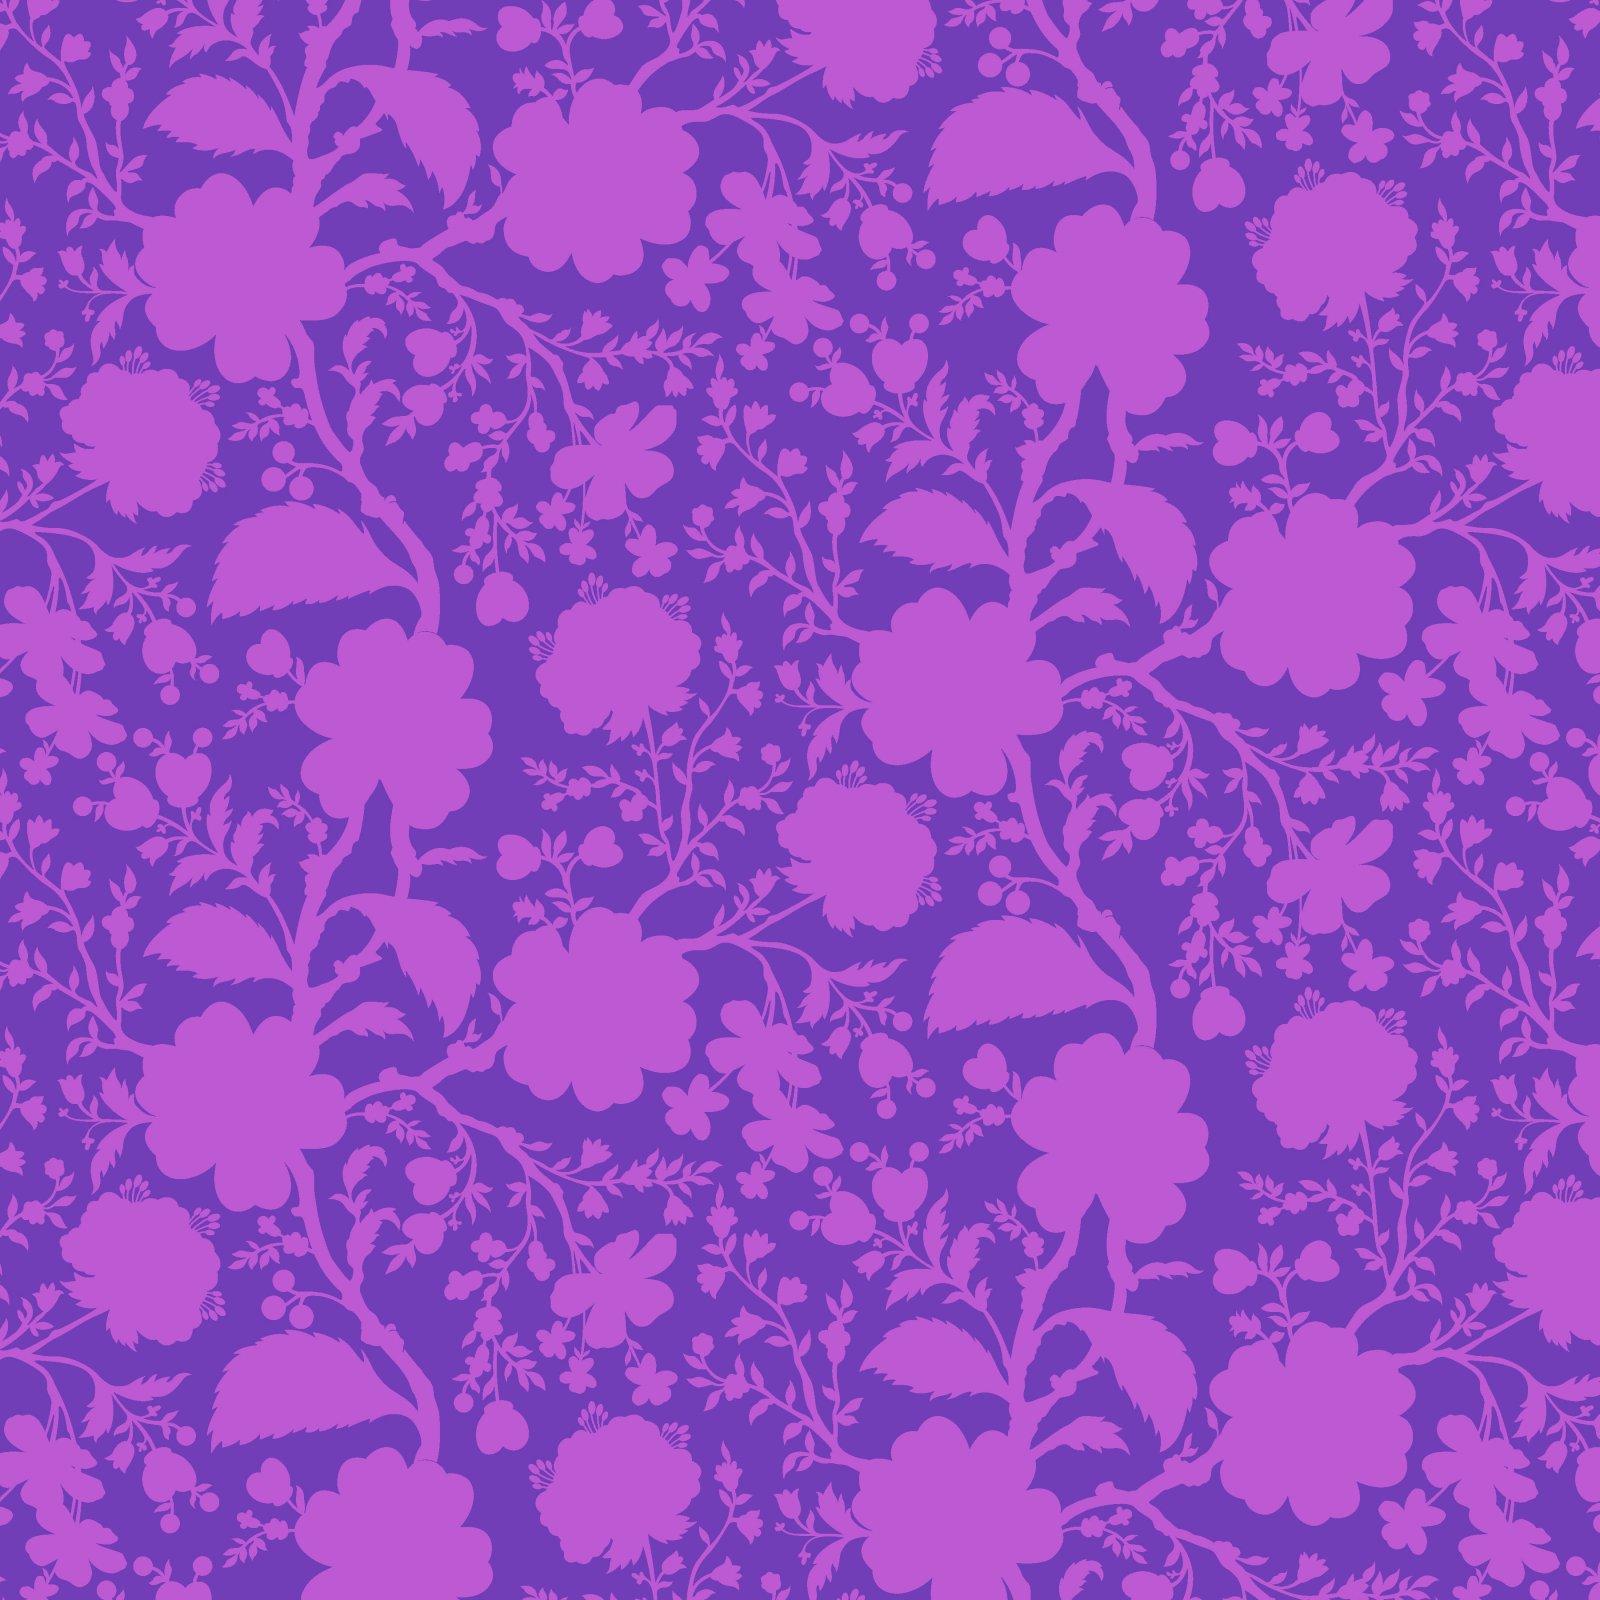 PWTP149.DAHLIA - Tula Pink Wildflower - Dahlia